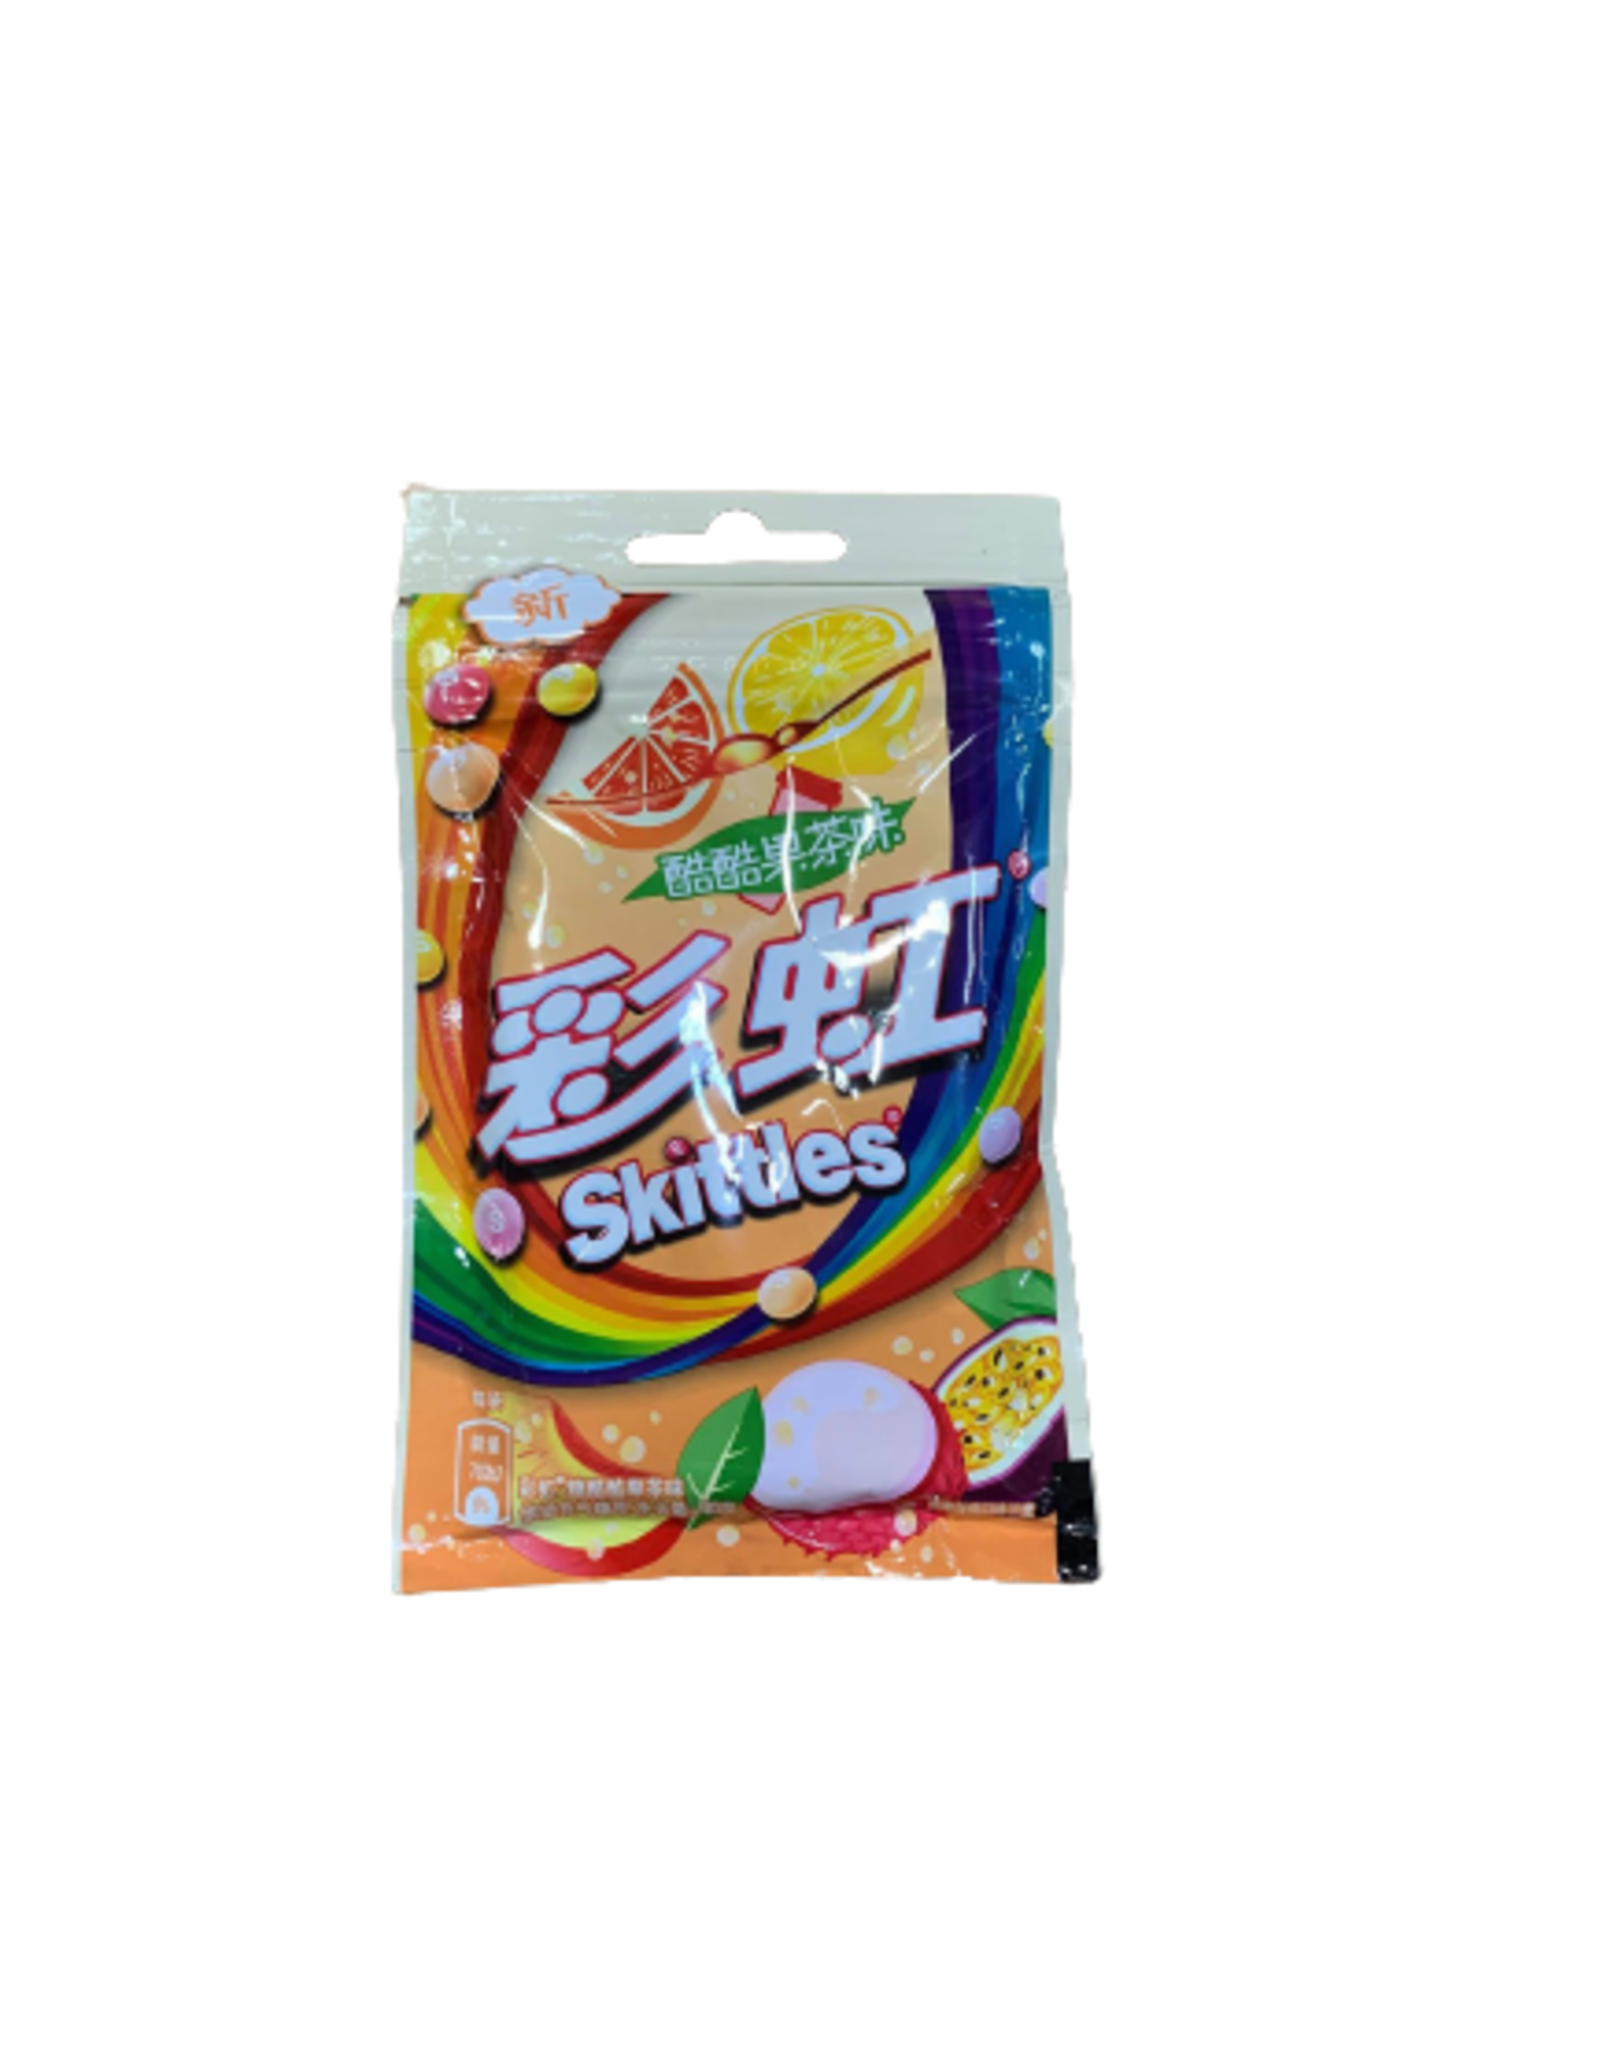 Skittles Lychee